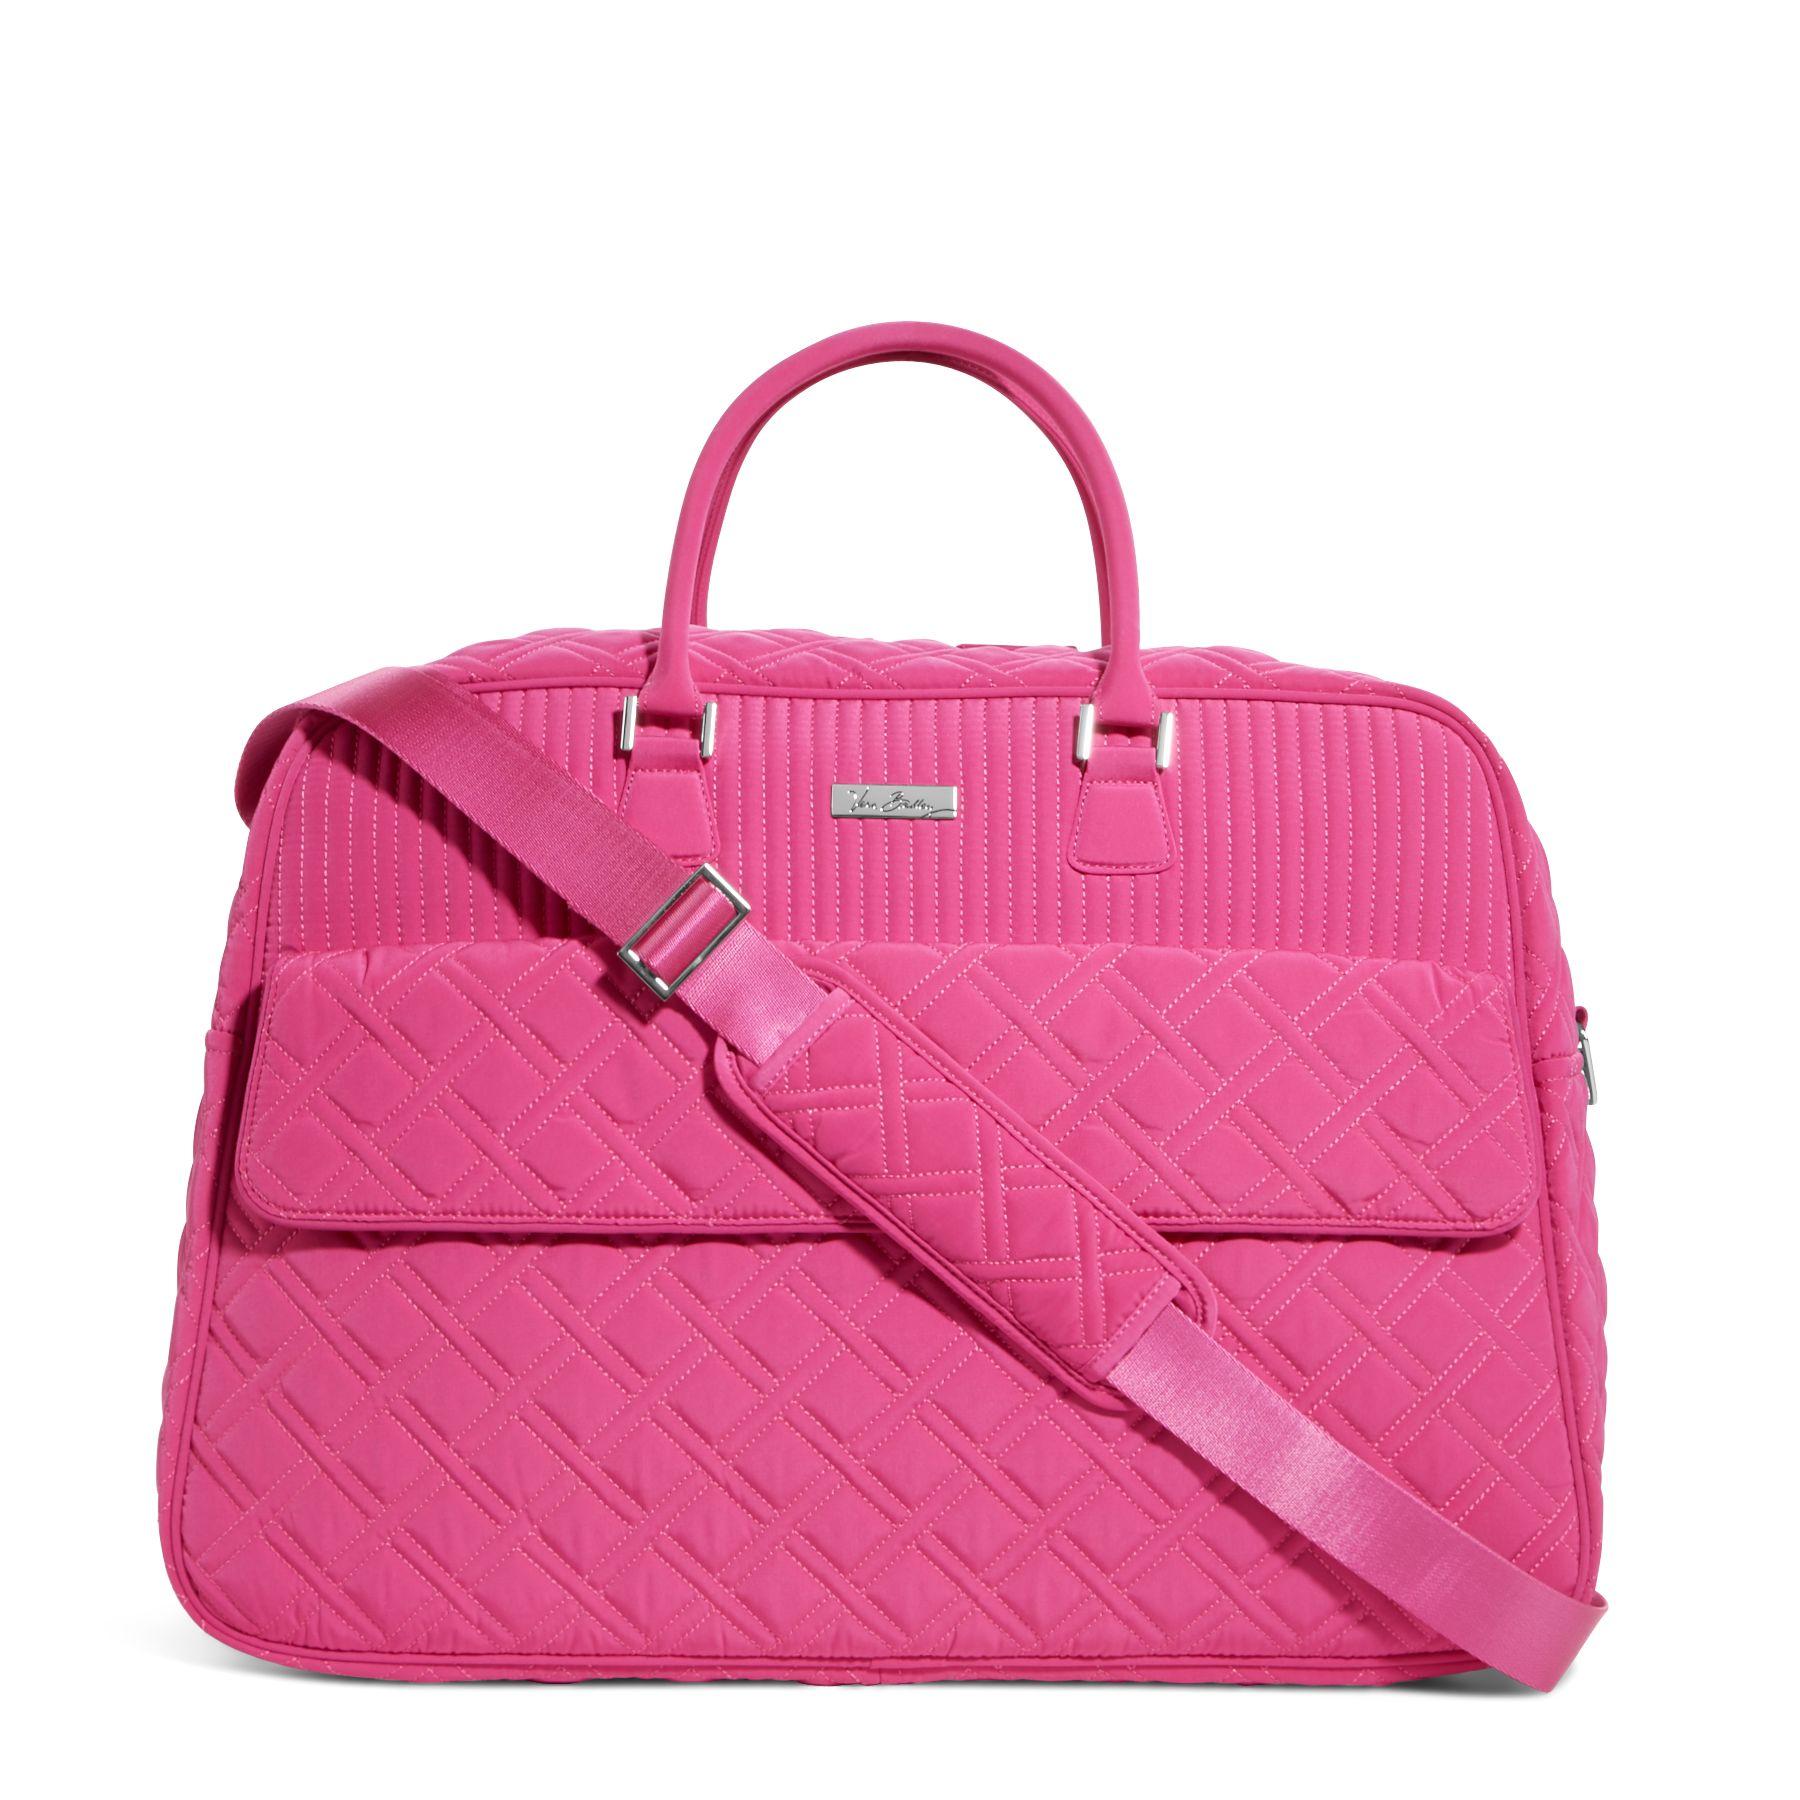 Vera Bradley Grand Traveler Bag in Fuchsia